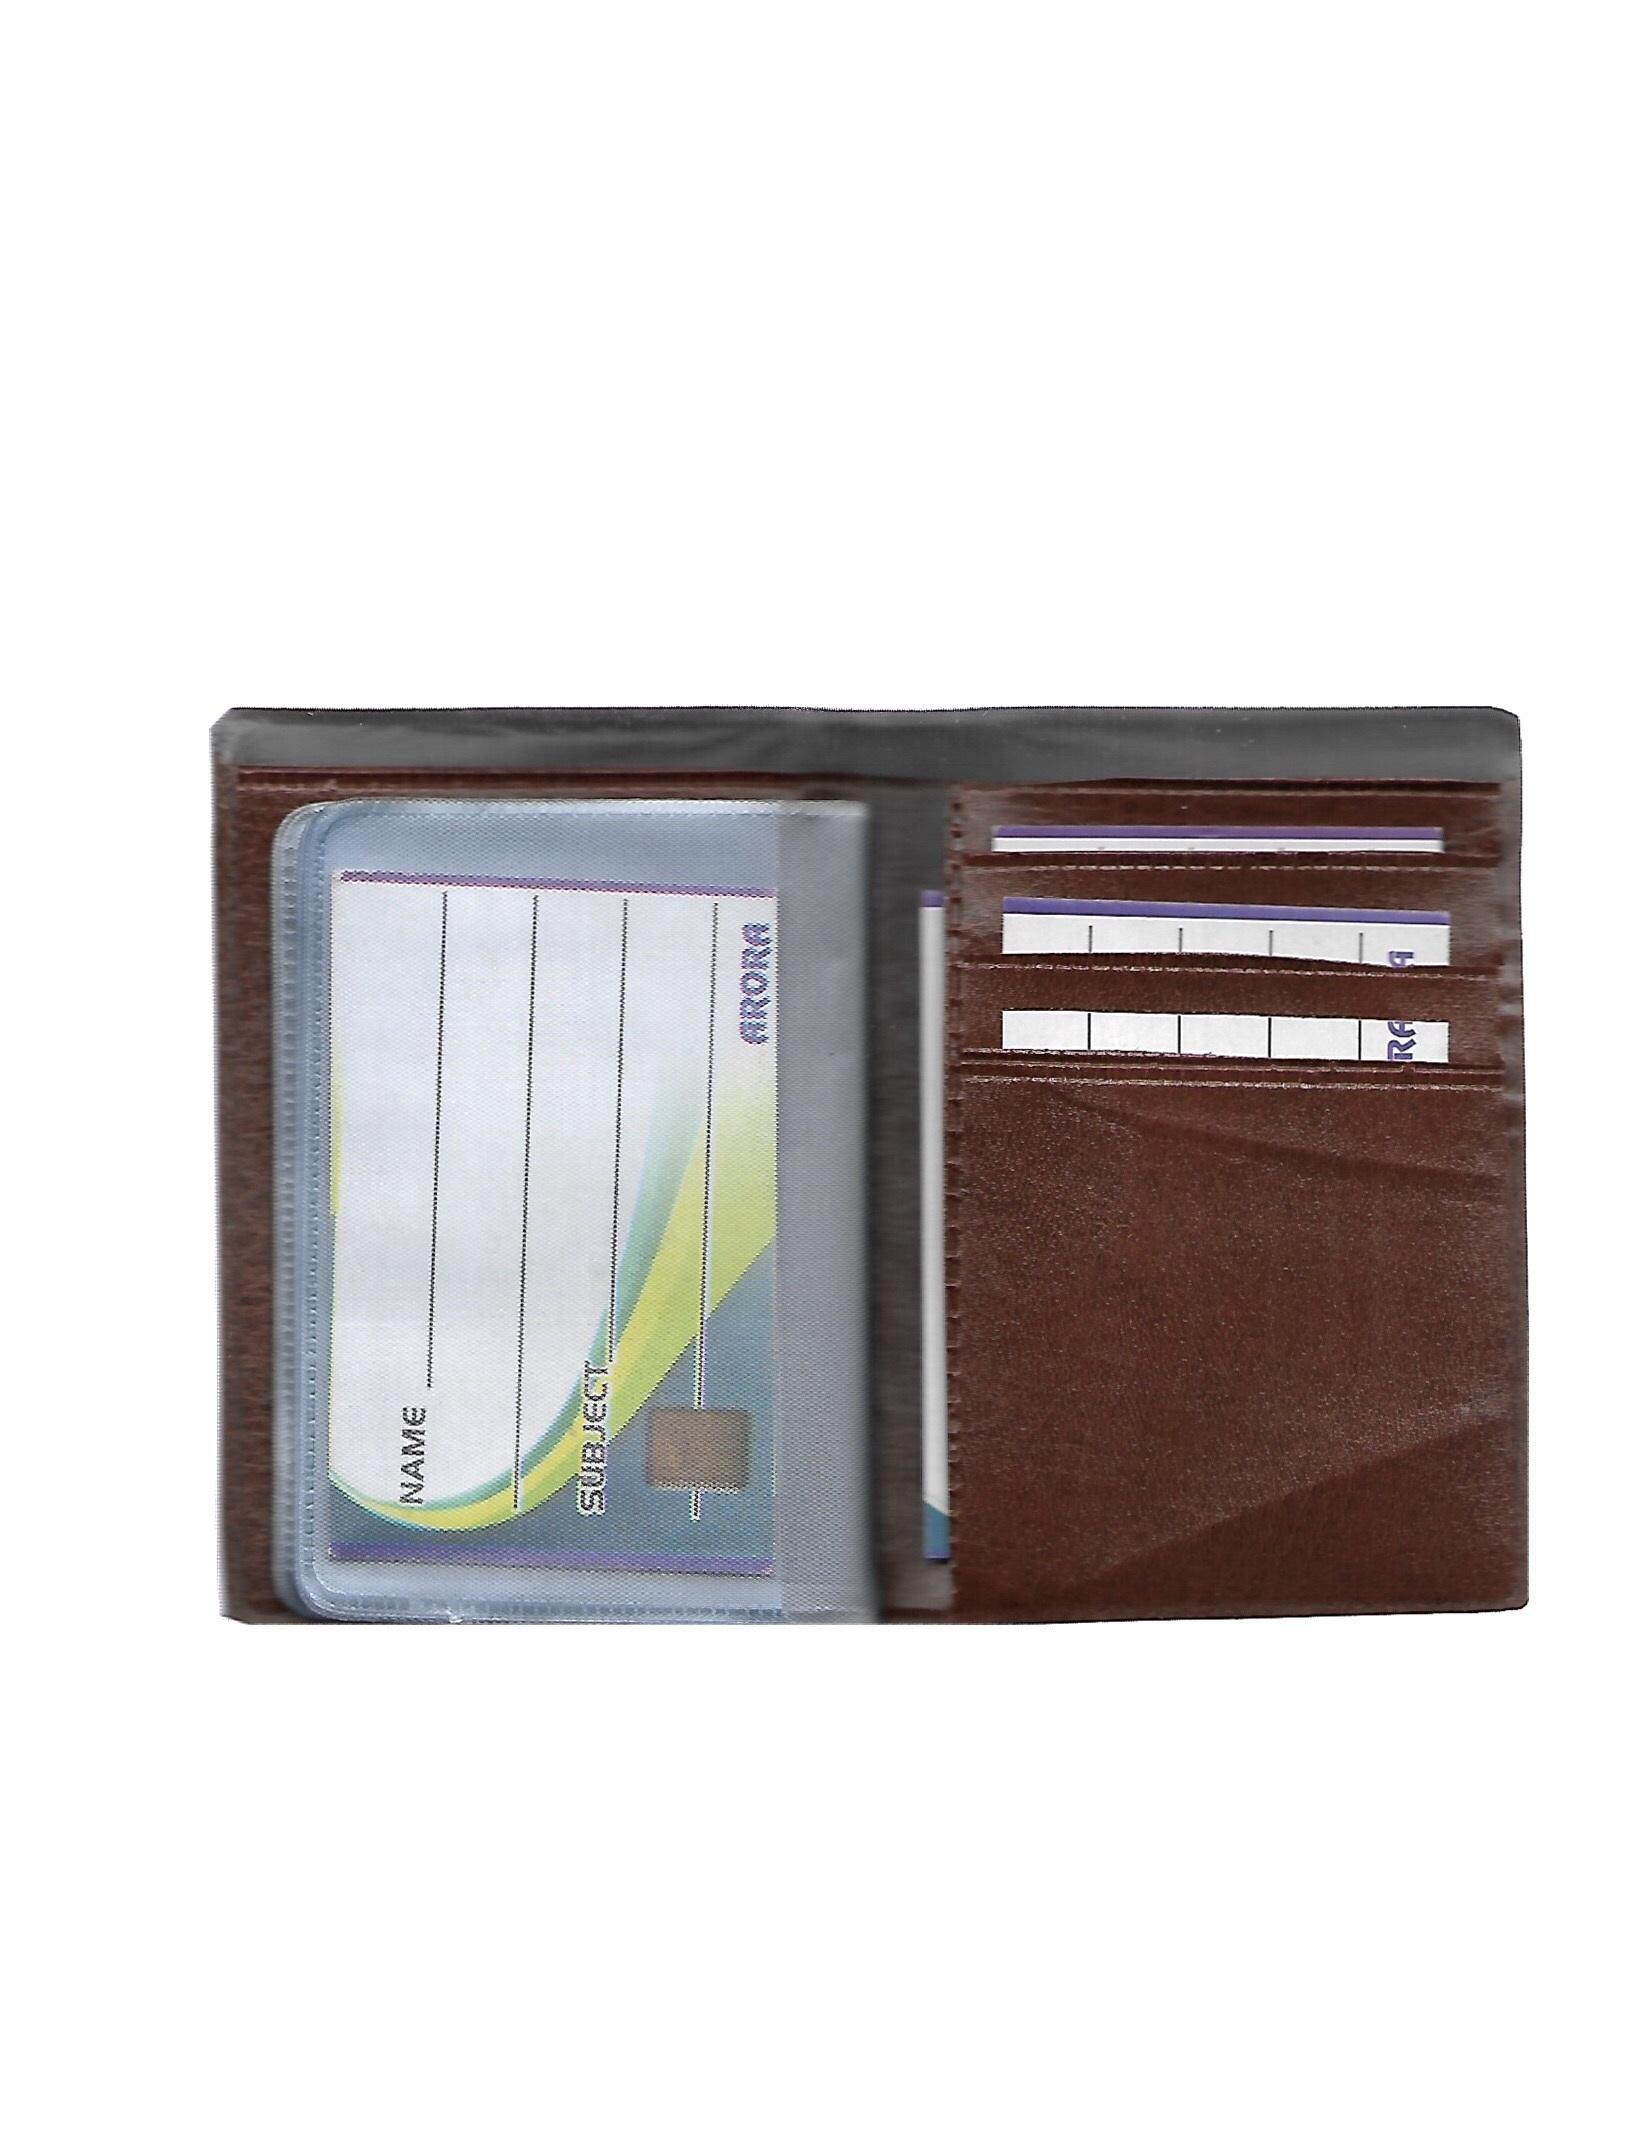 ATM Card Holder & Money Wallet